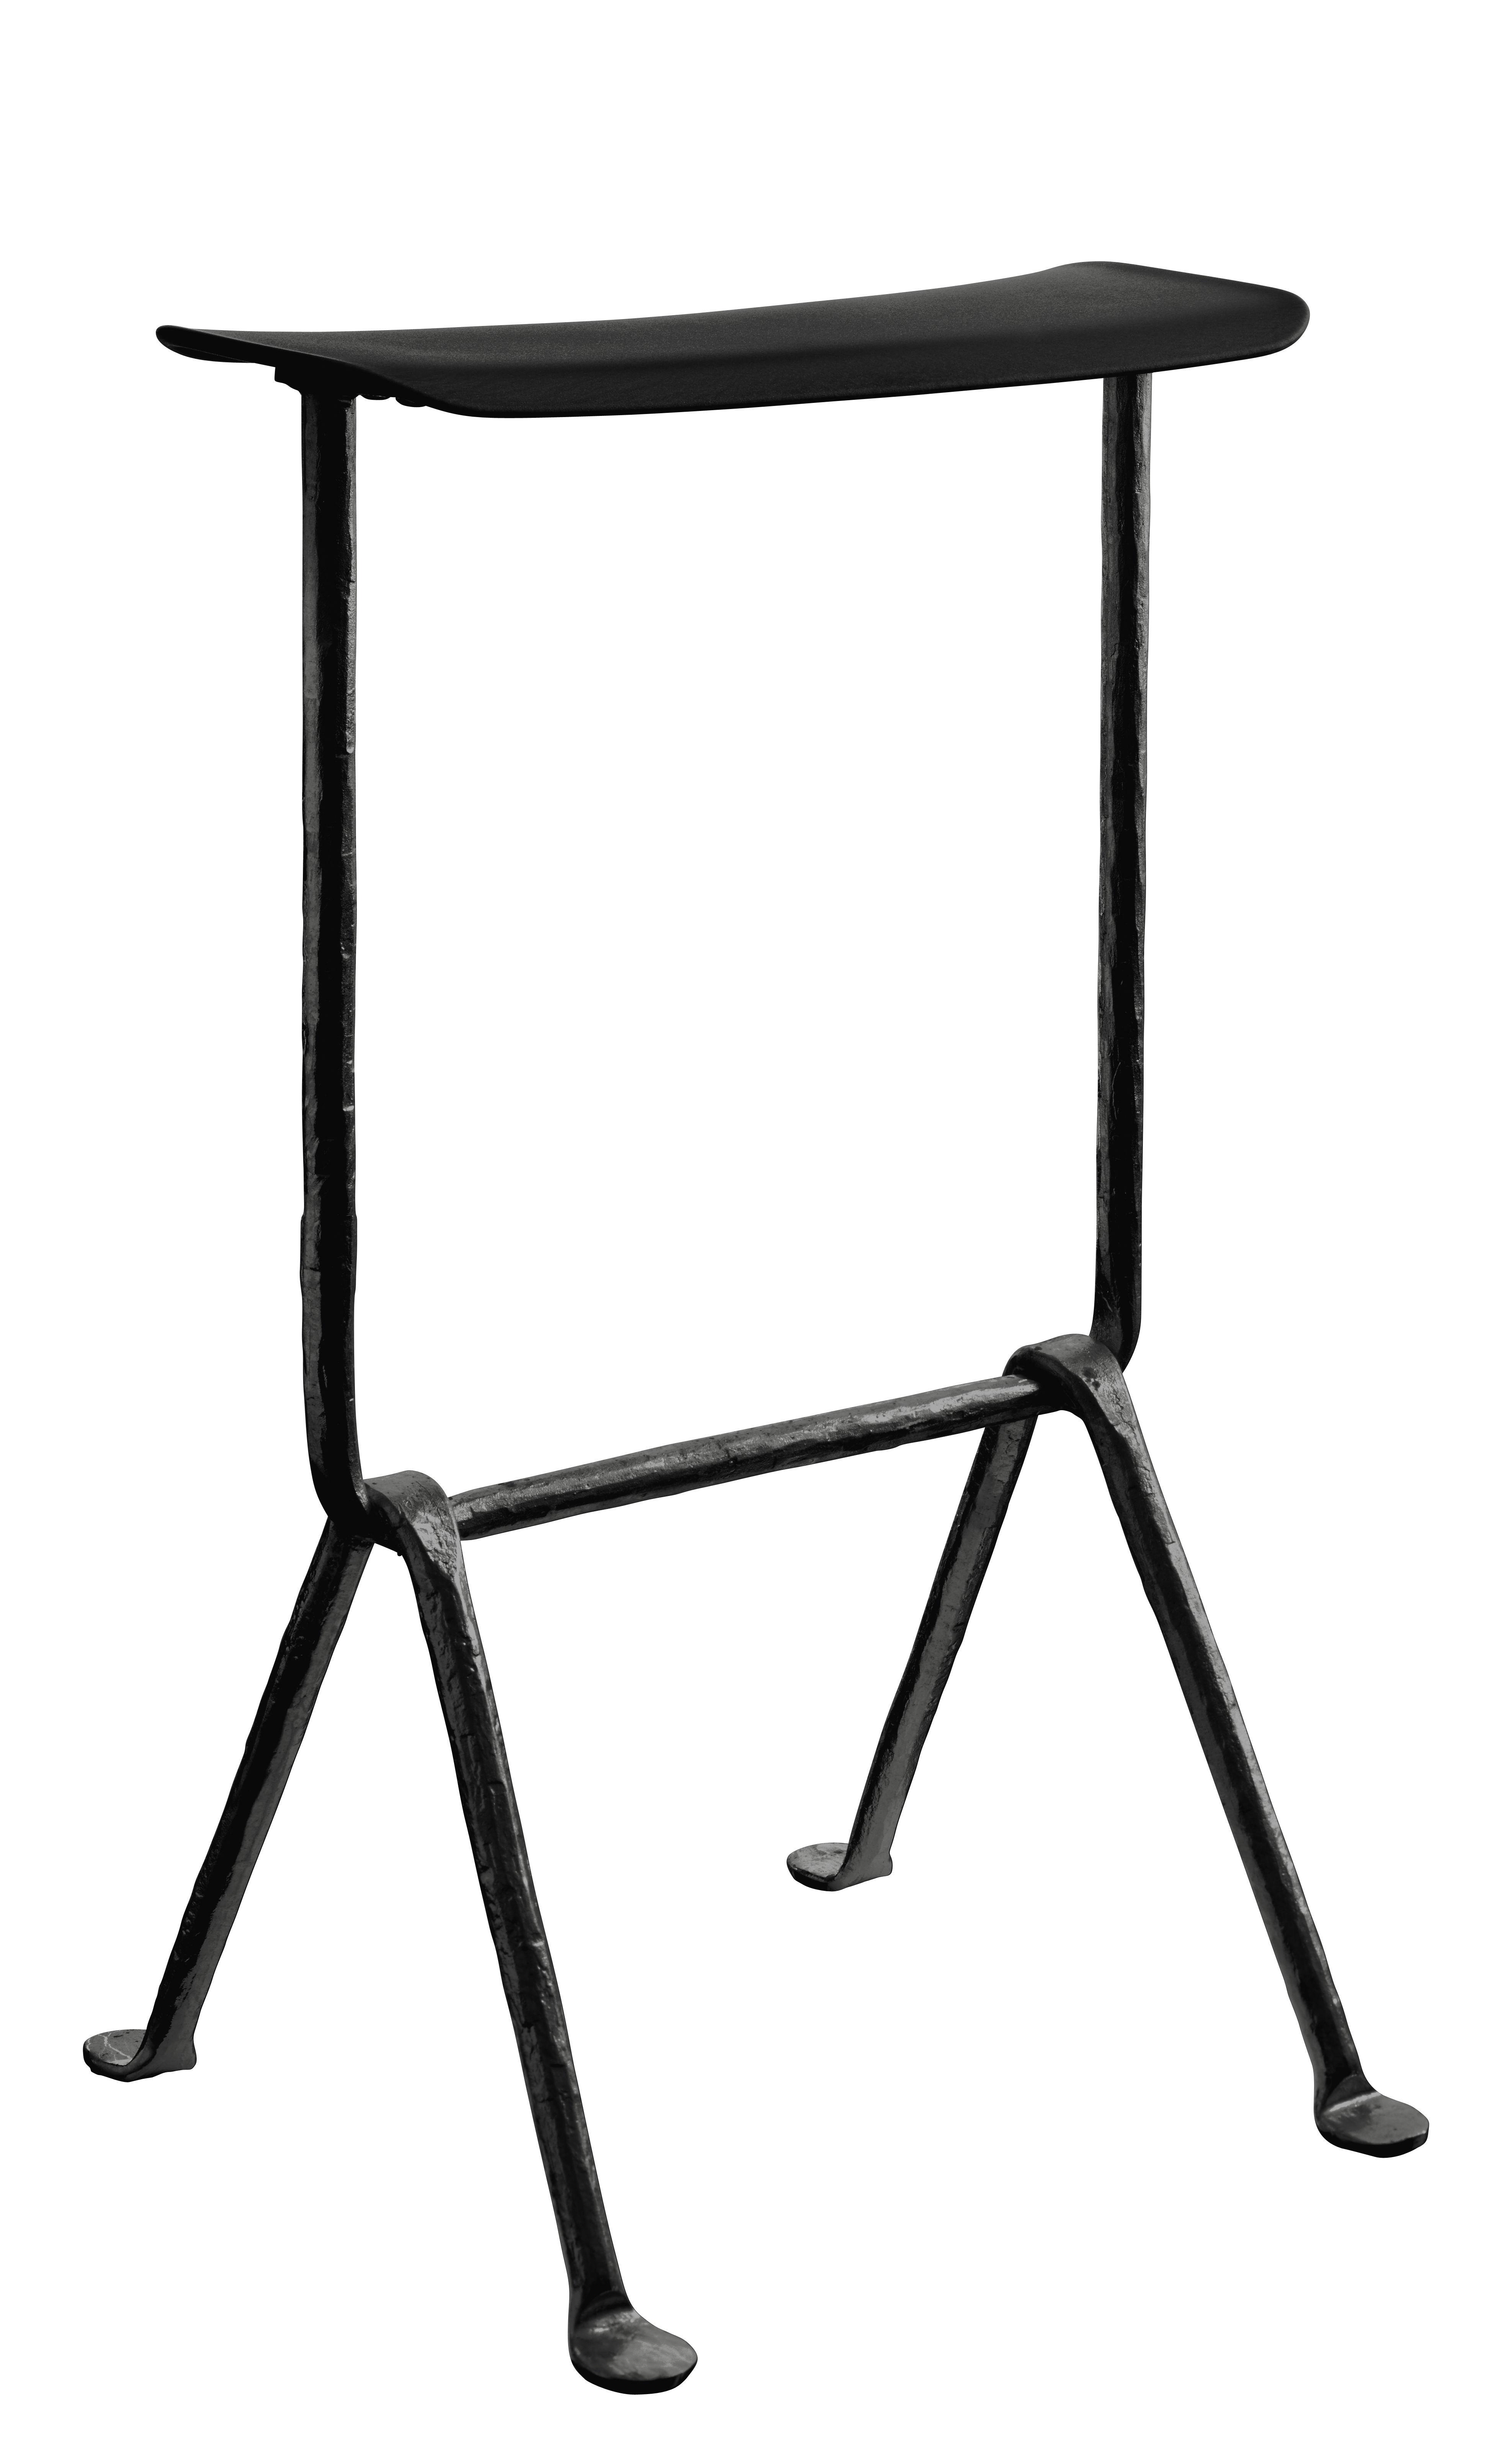 Arredamento - Sgabelli da bar  - Sgabello da bar Officina / Polipropilene - H 65 cm - Magis - Nero / Struttura nera - Ferro battuto , Polipropilene